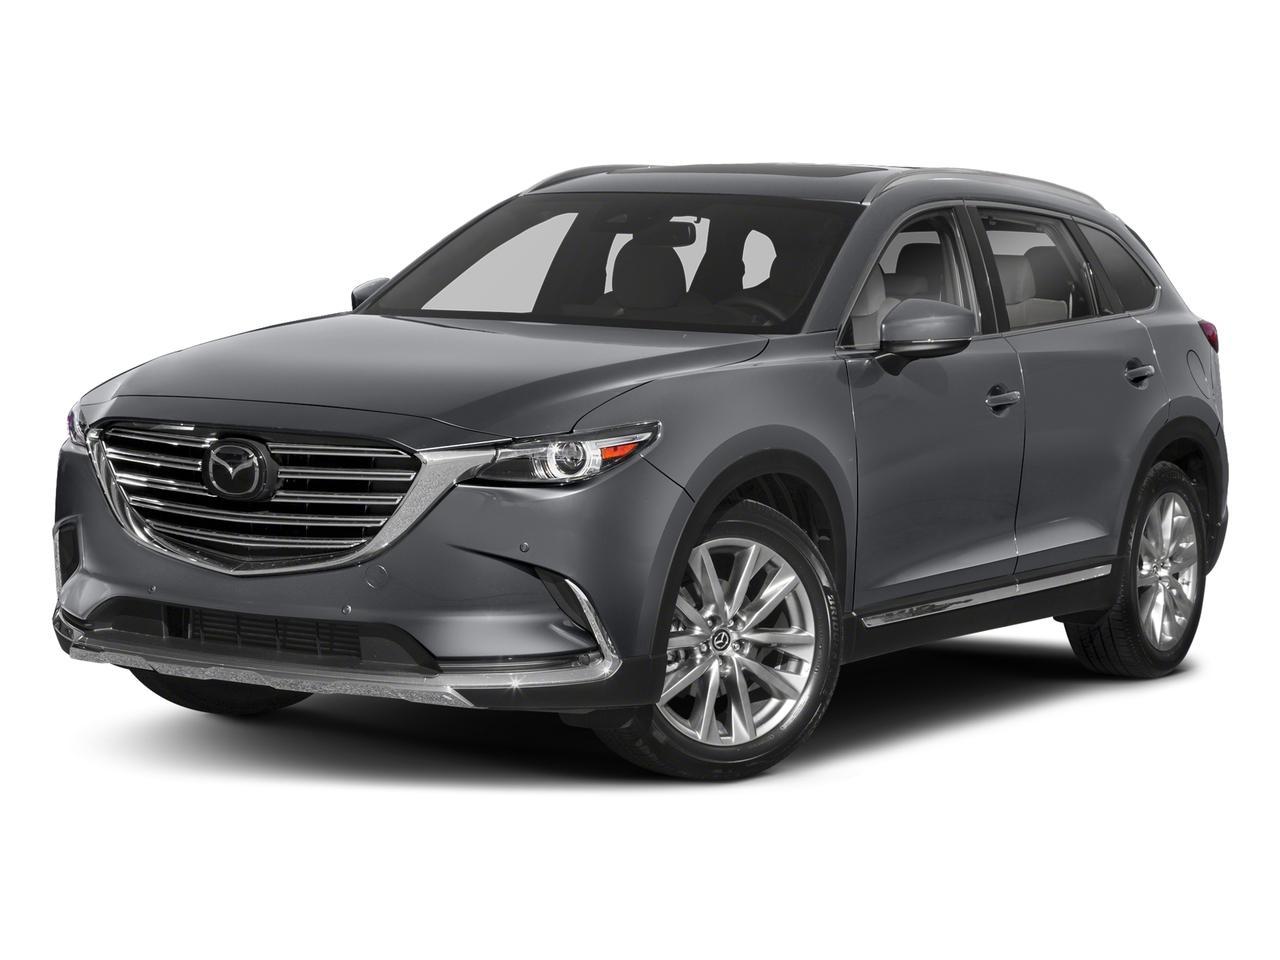 2018 Mazda CX-9 Vehicle Photo in Tucson, AZ 85712